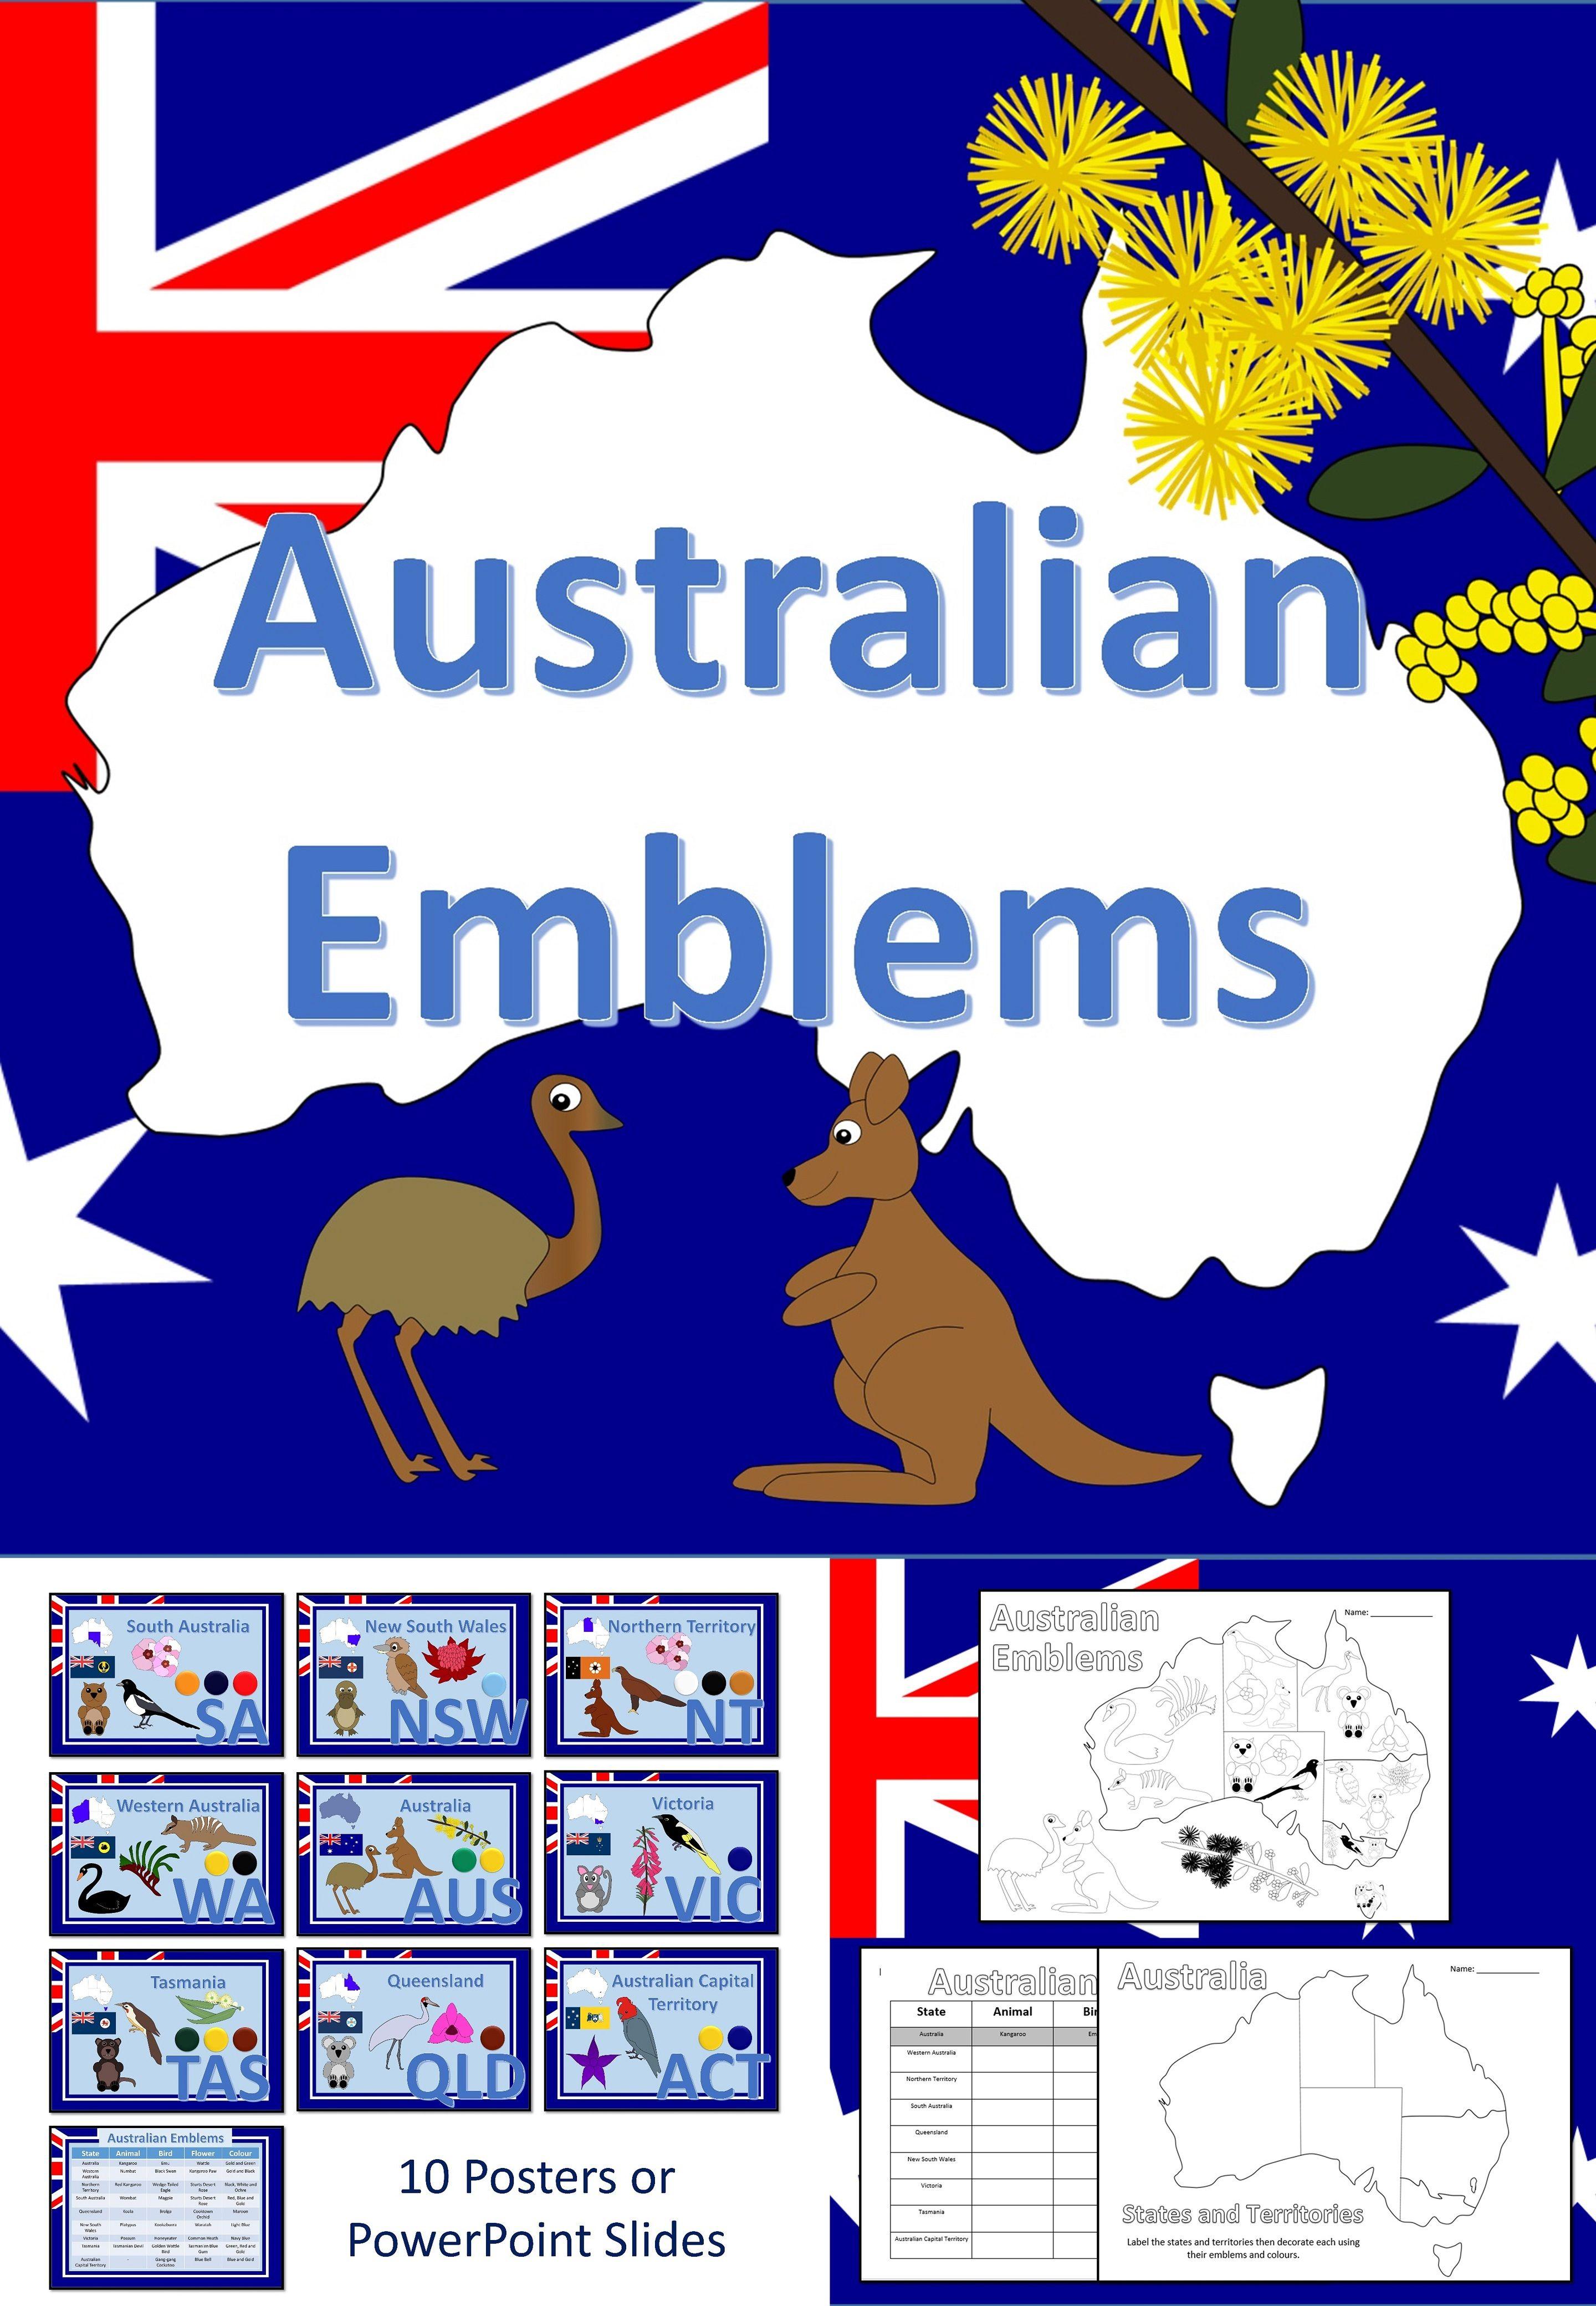 Australian Emblems